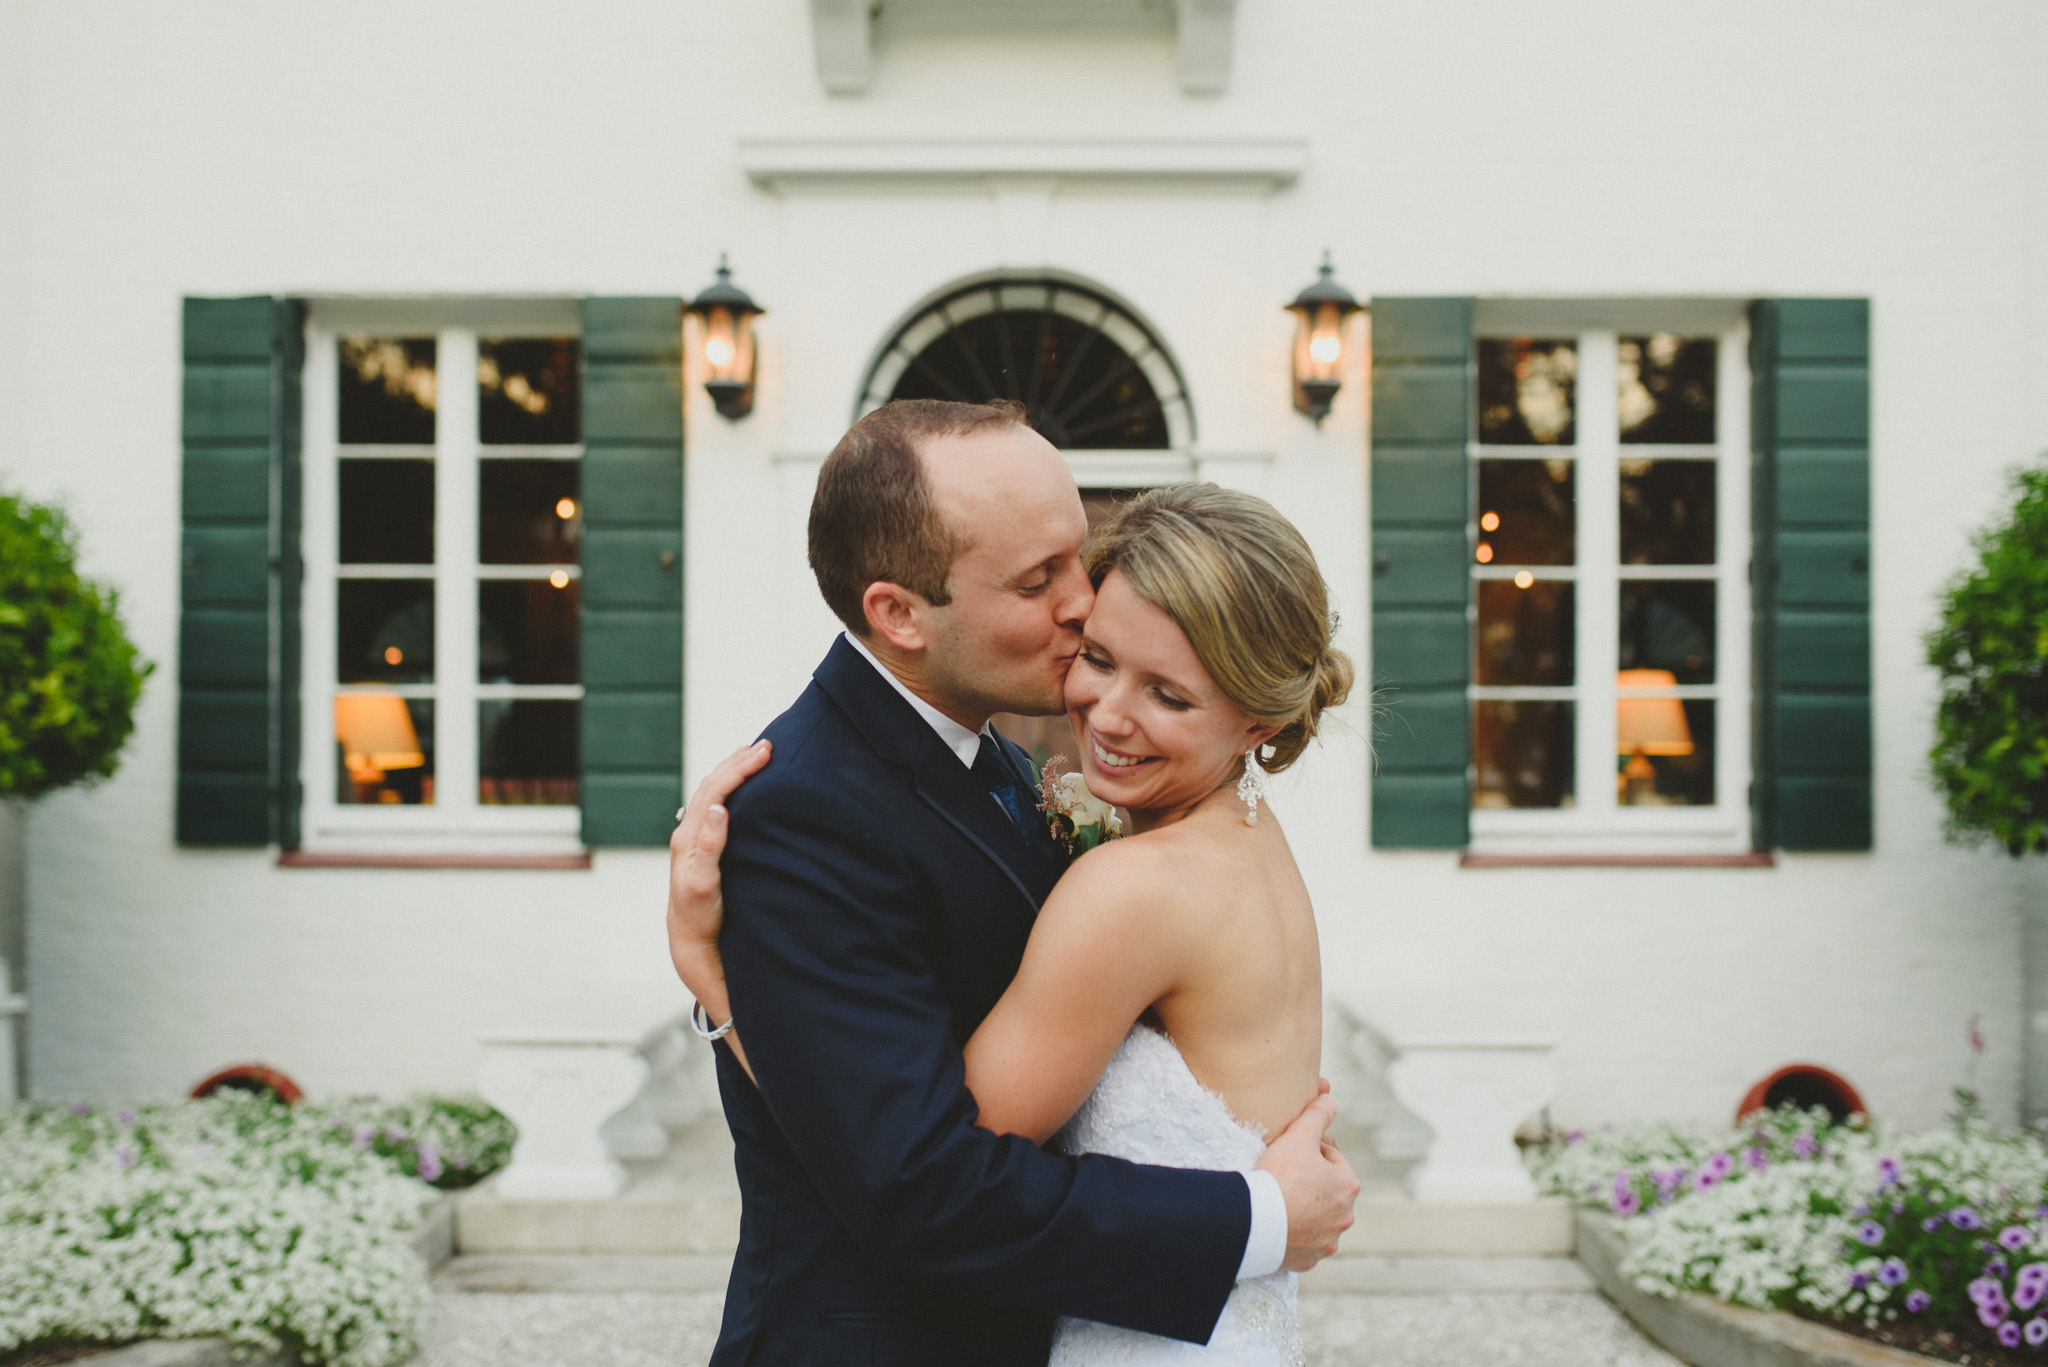 Jekyll Island - Bride and Groom hugging